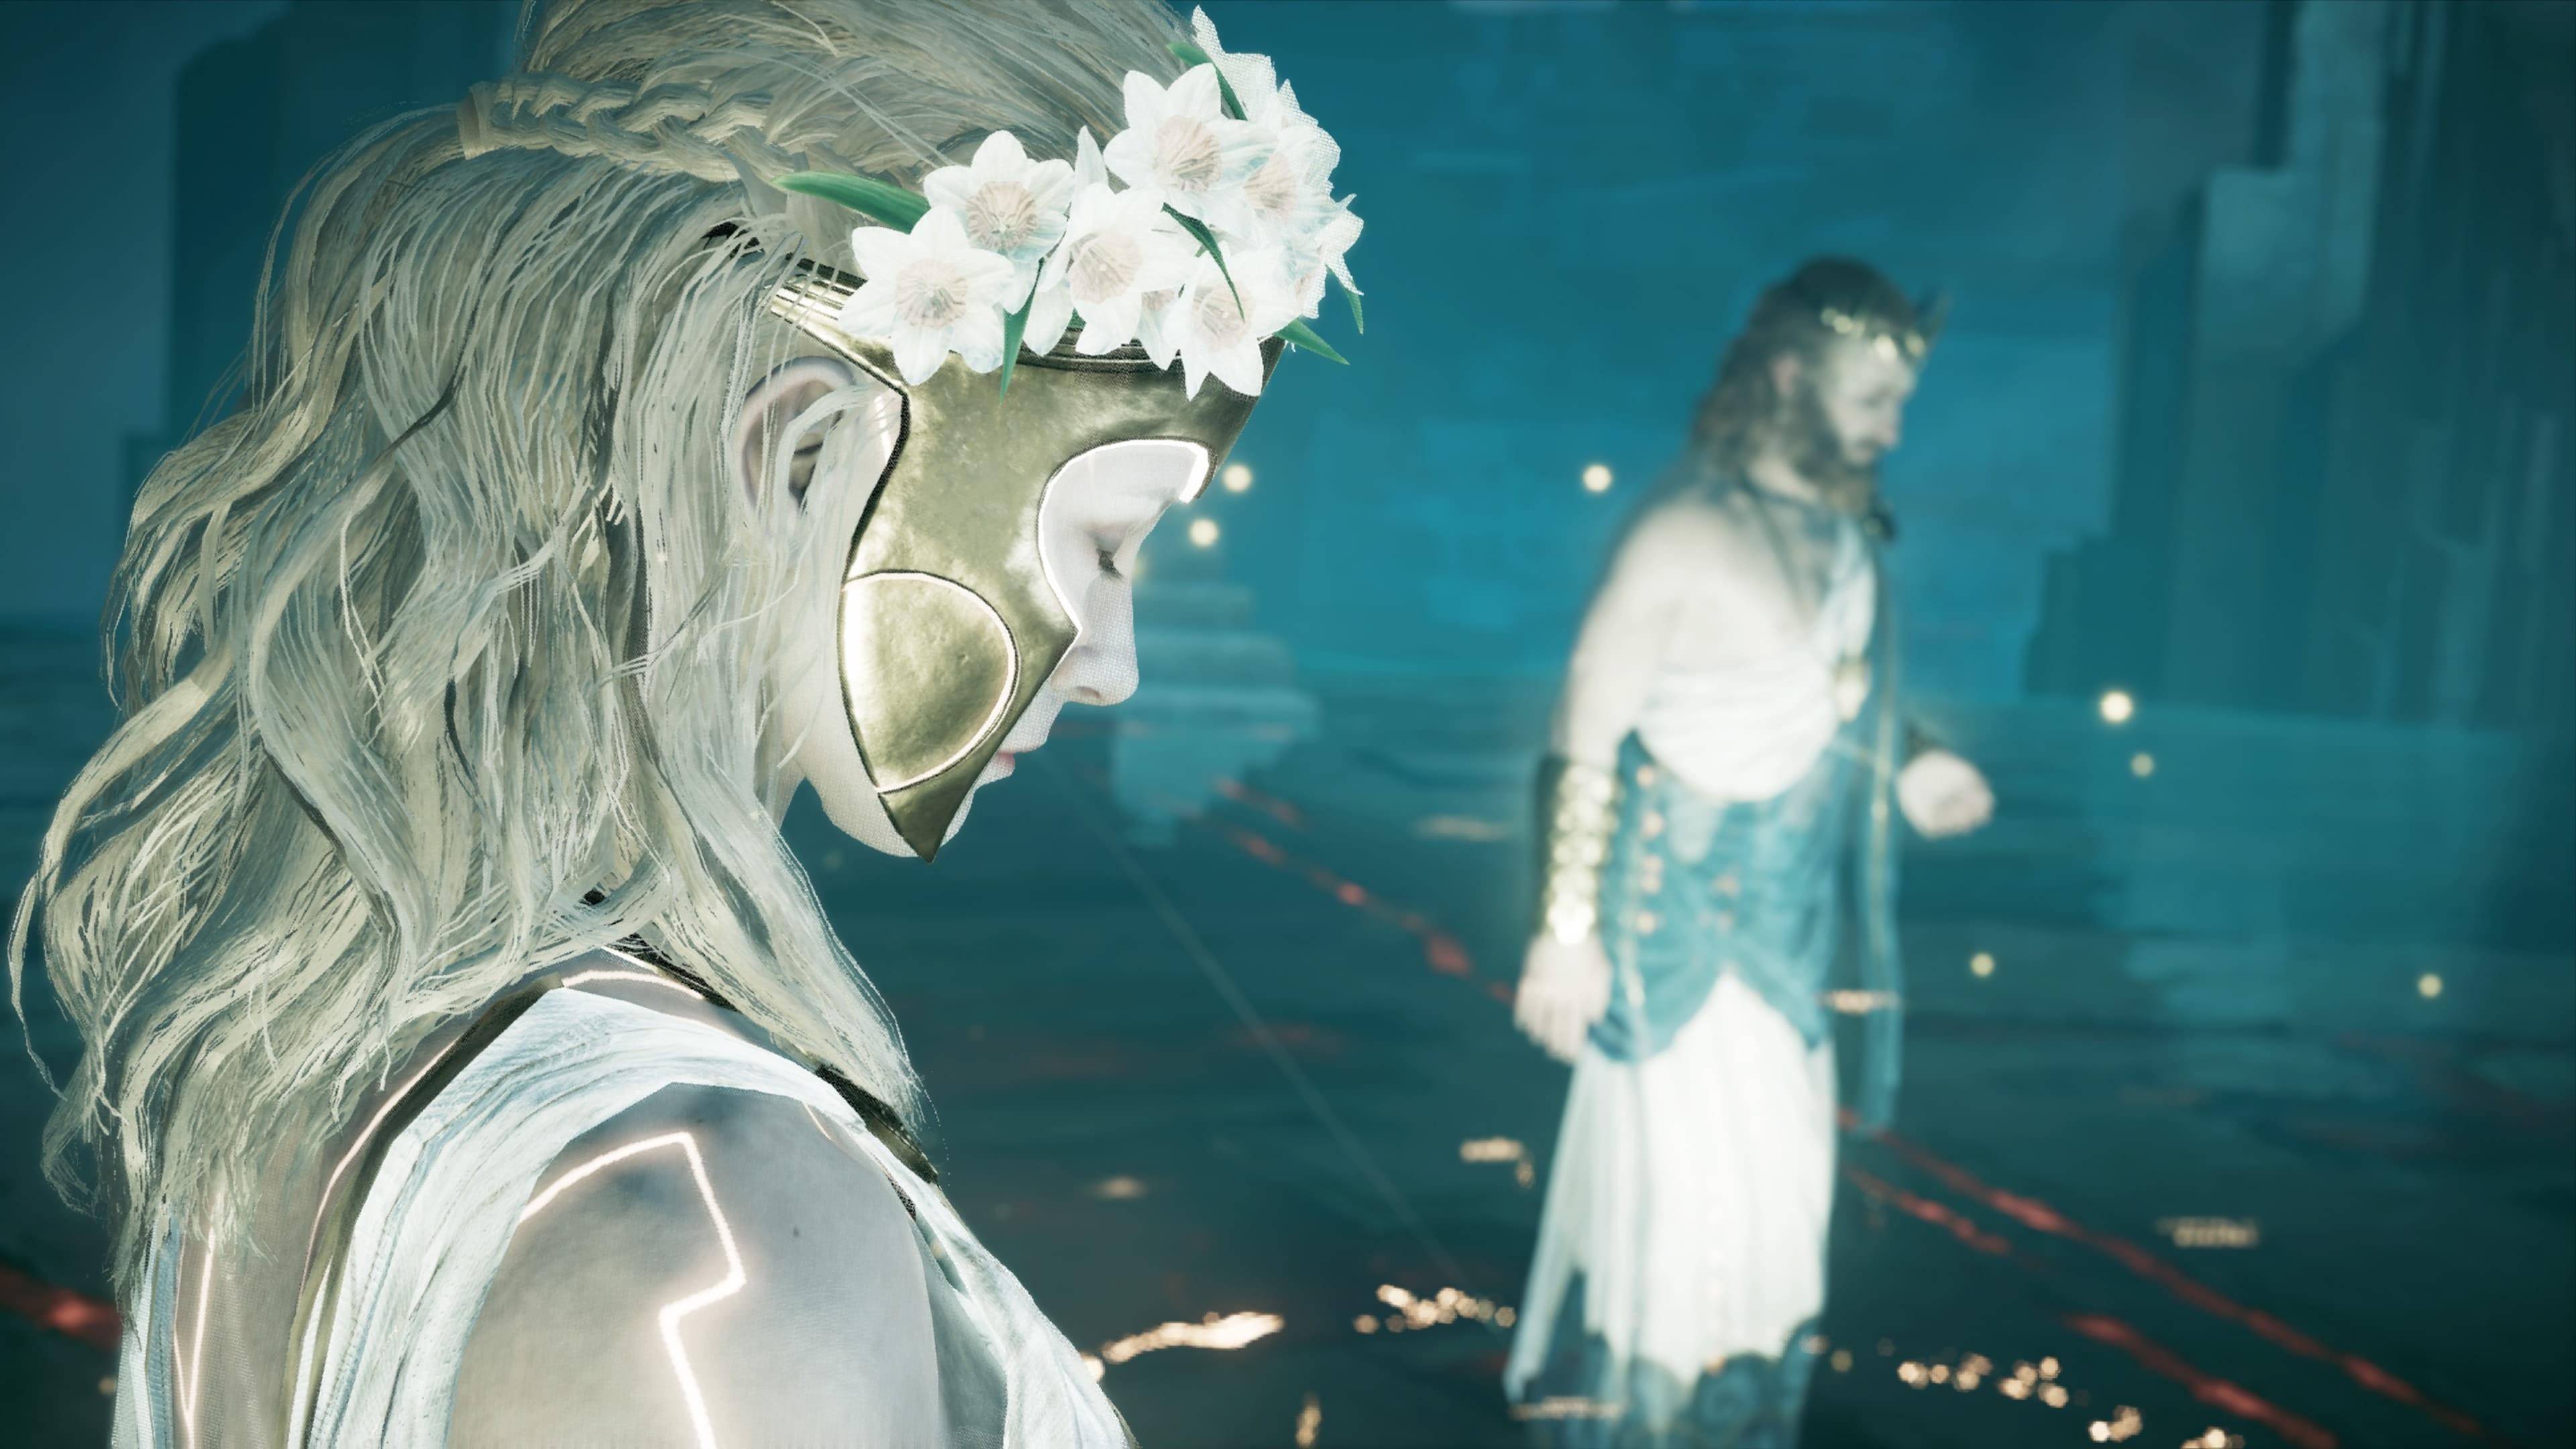 Assassin's Creed Valhalla Isu